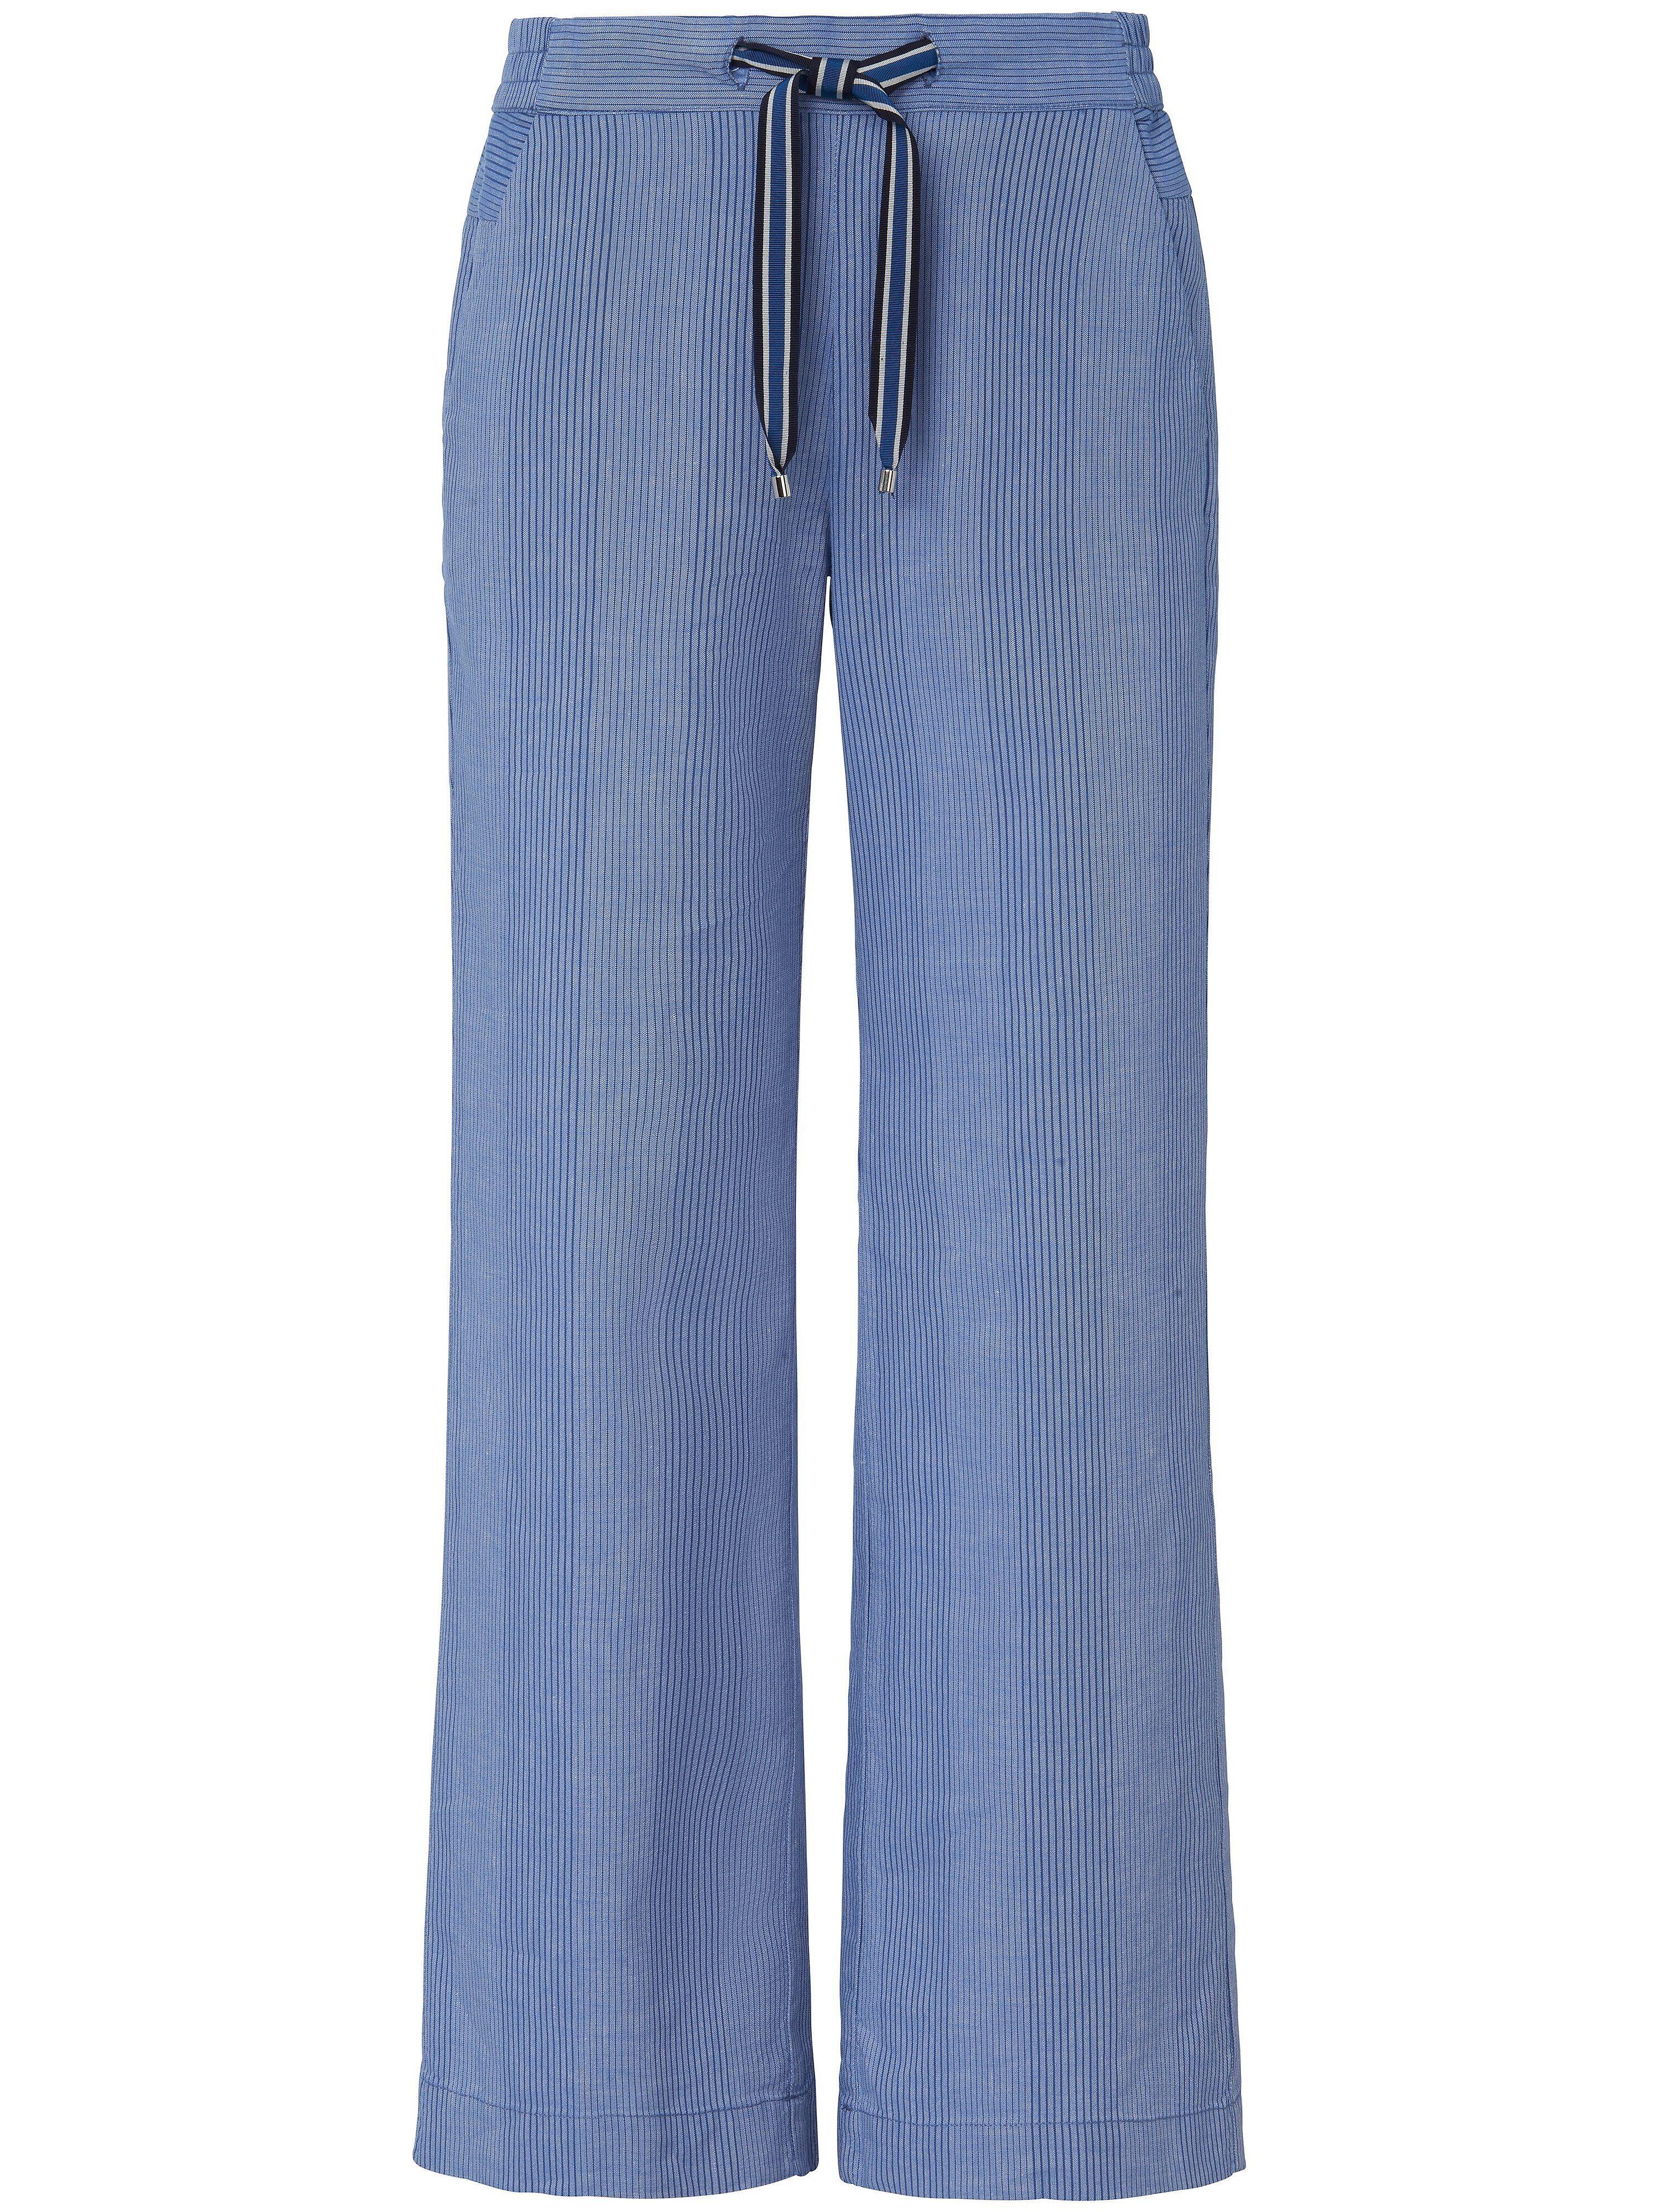 Lanius Le pantalon ligne Marlene Lanius bleu 40